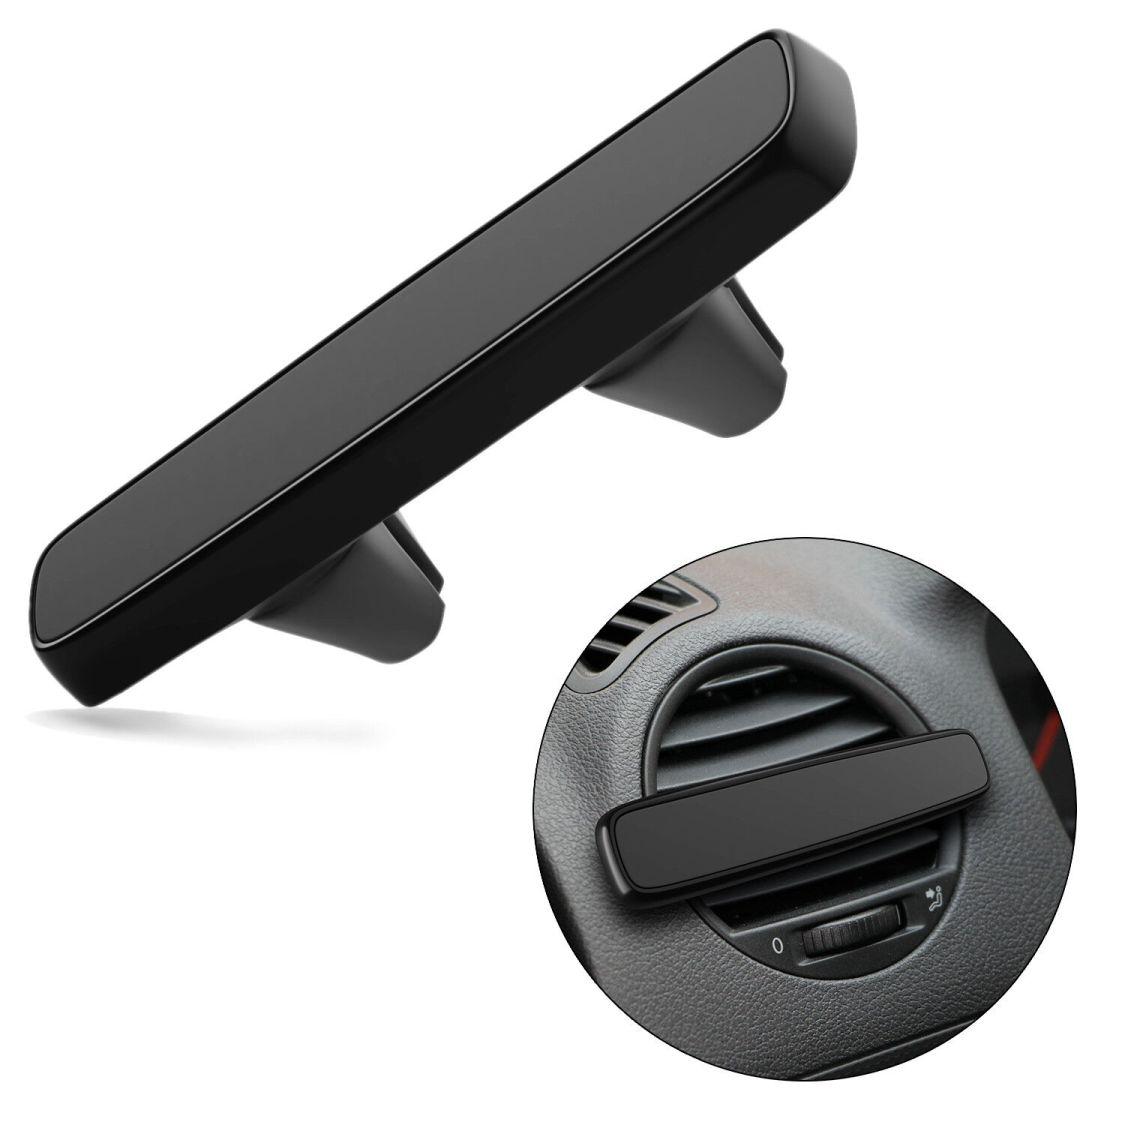 Ecotal Auto Handyhalterung Magnet Lüftungsgitter extra stark magnetisch 360 Grad